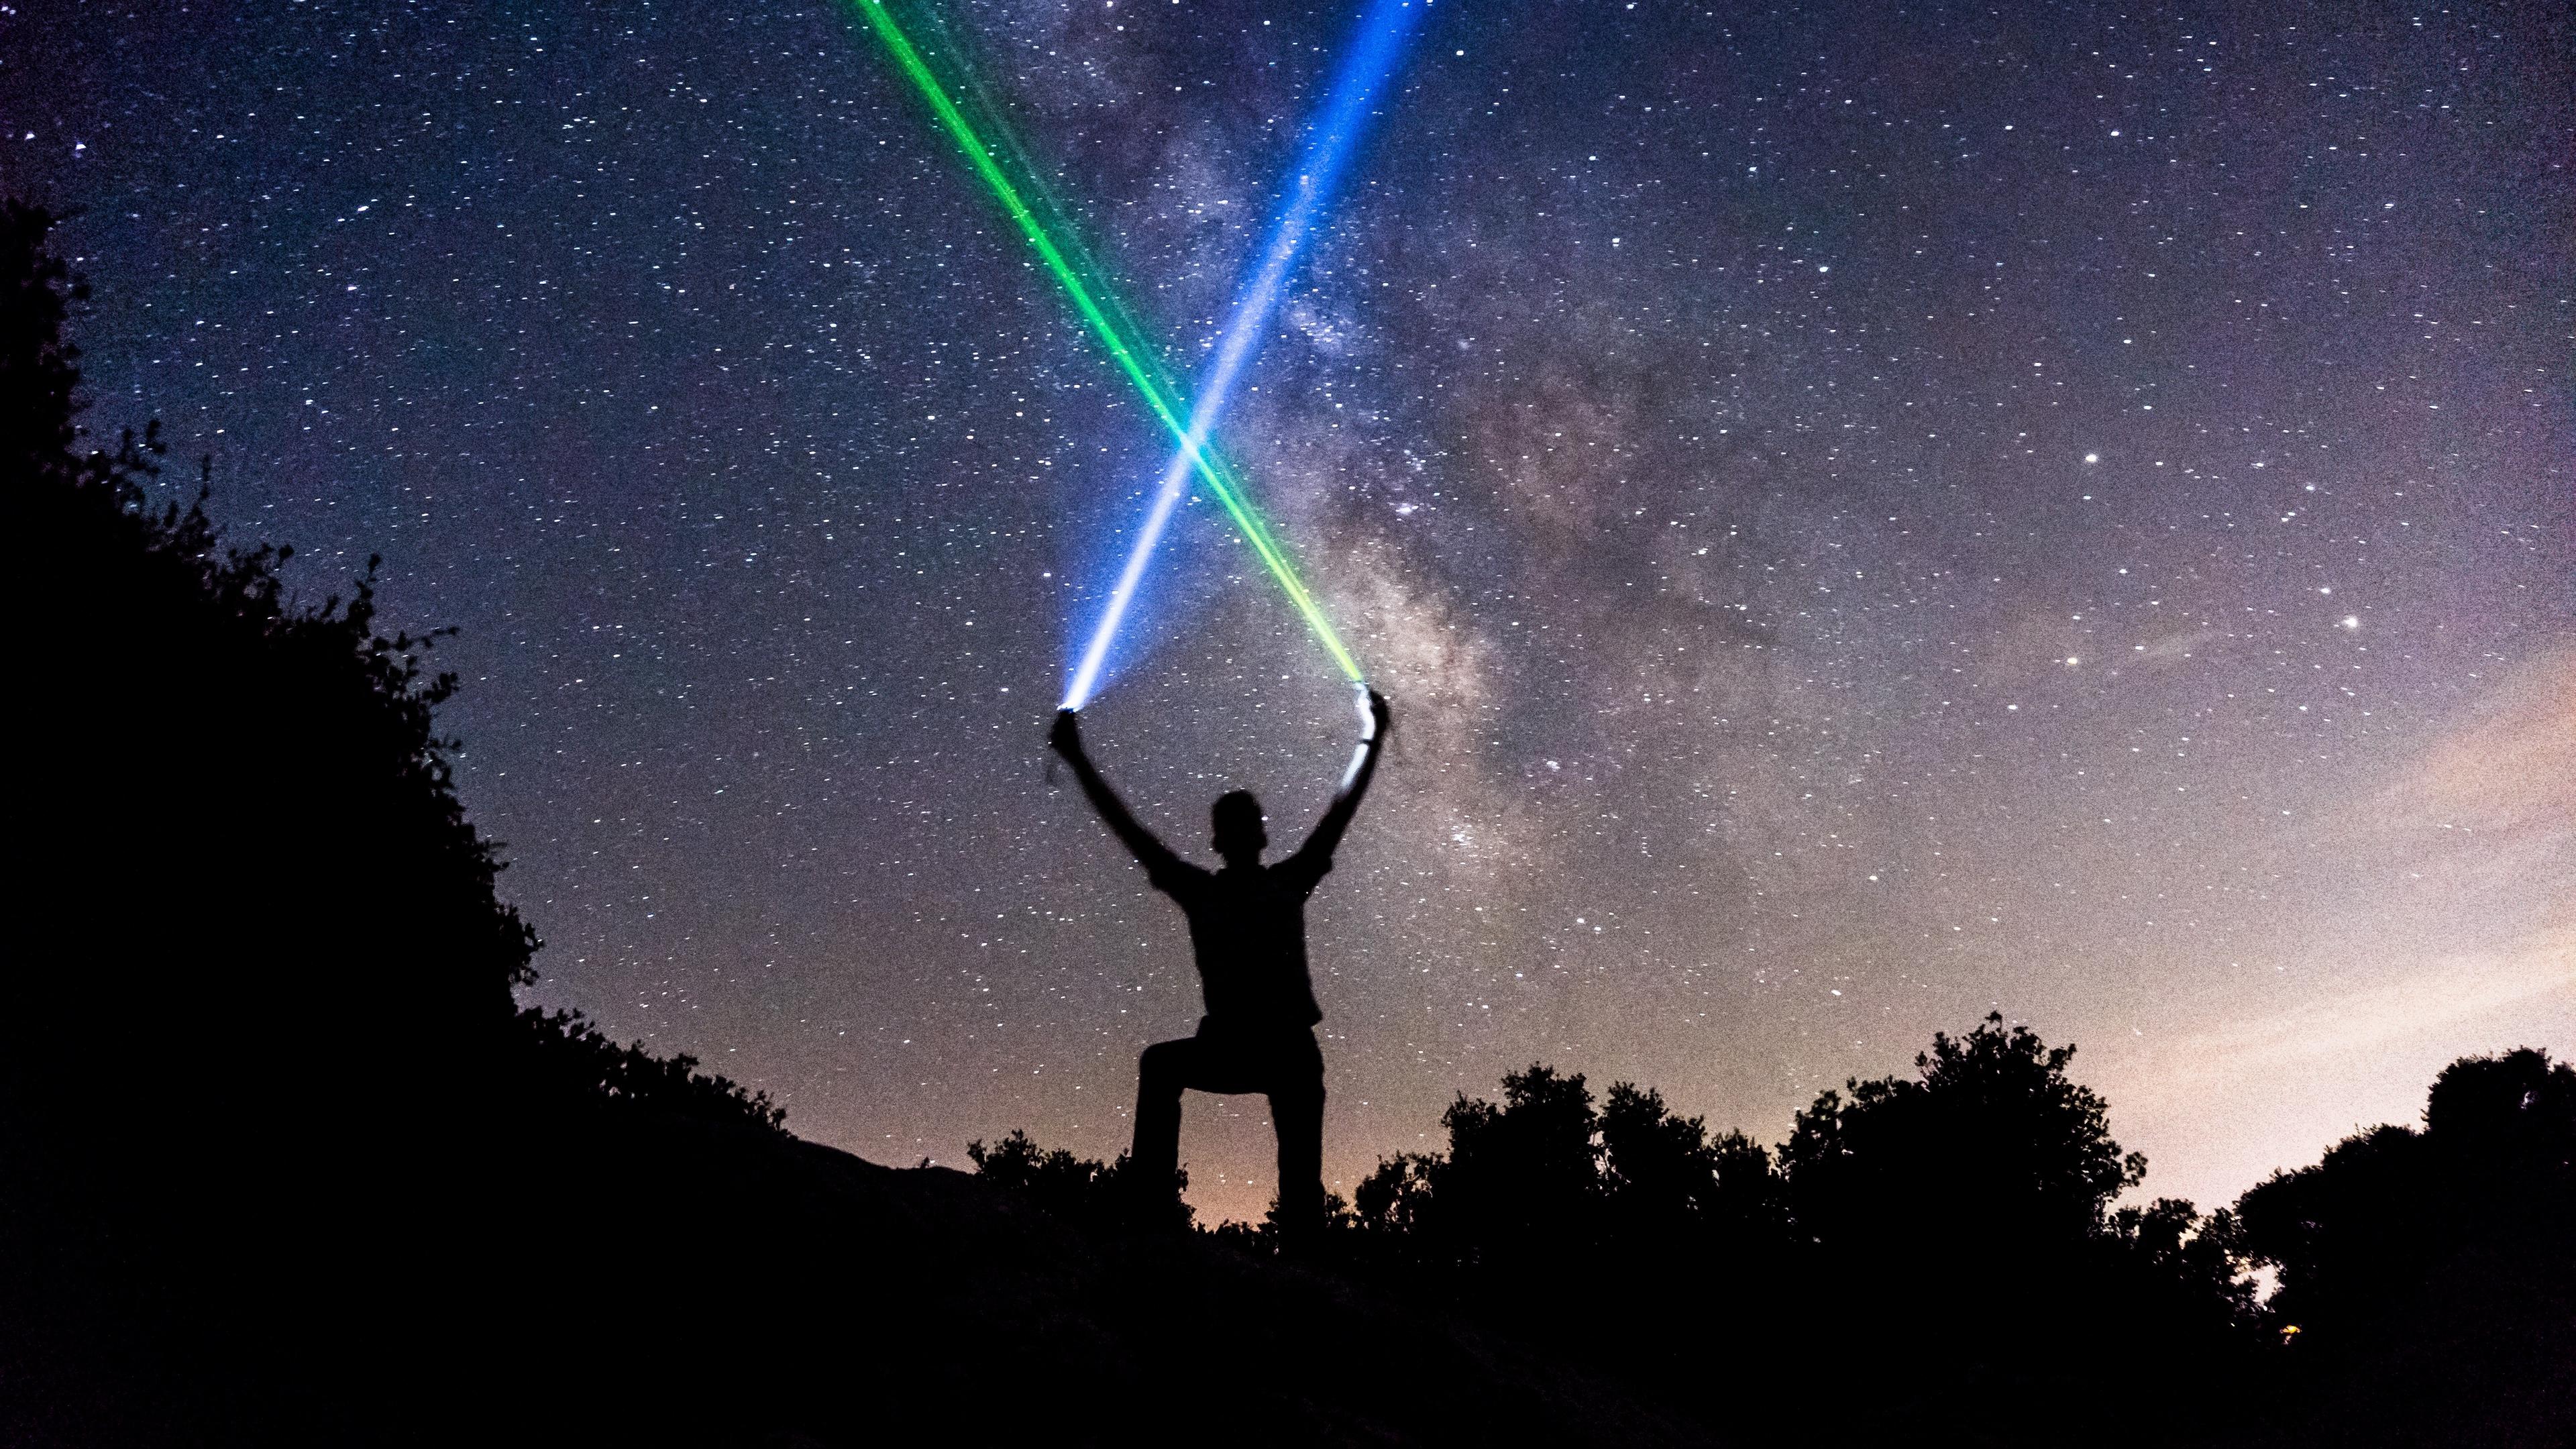 light swords starry sky silhouette stars night 4k 1540576061 - light swords, starry sky, silhouette, stars, night 4k - starry sky, Silhouette, light swords